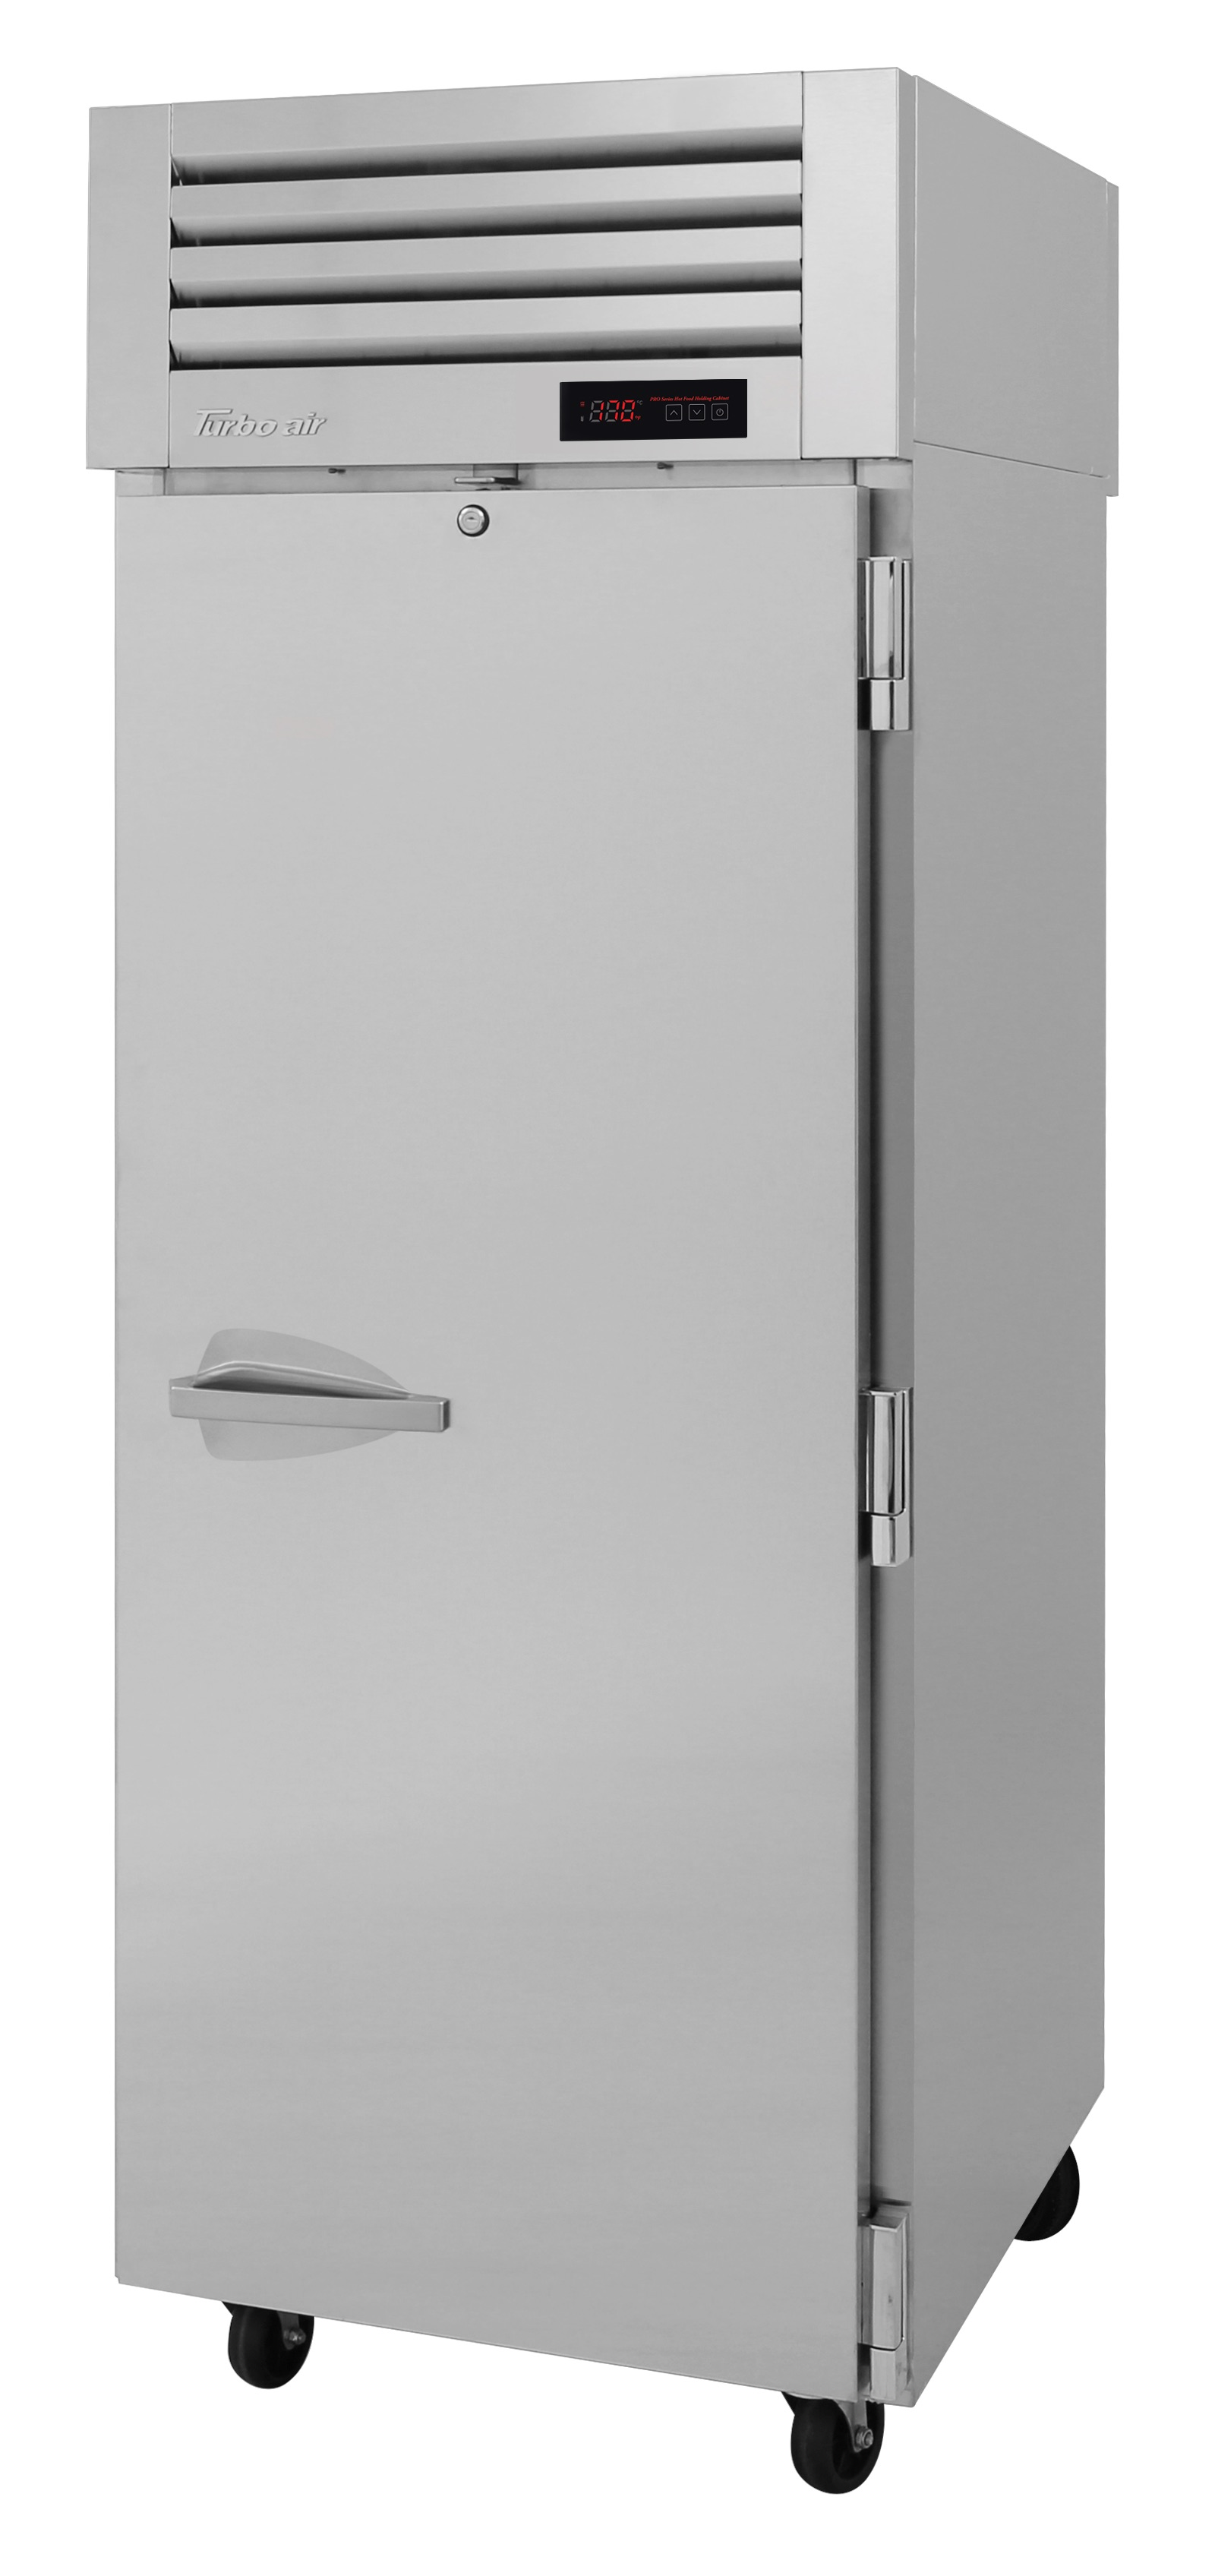 Turbo Air PRO-26H2 pro series - reach in refrigerator